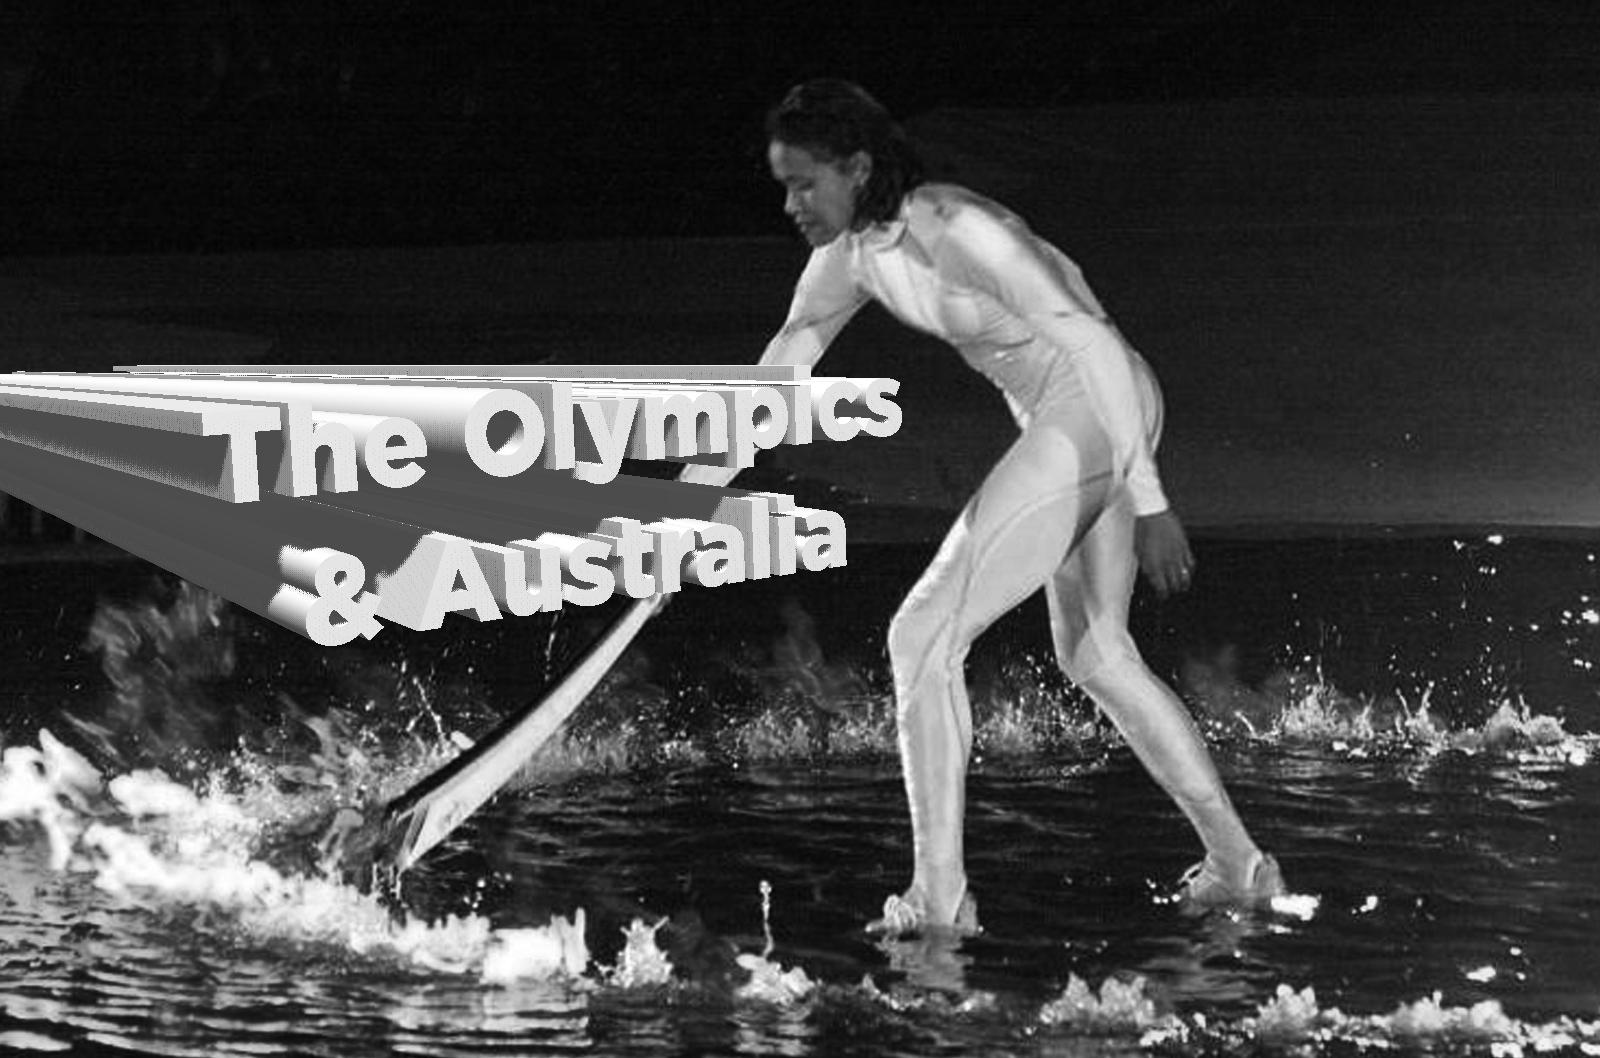 The Olympics & Australia